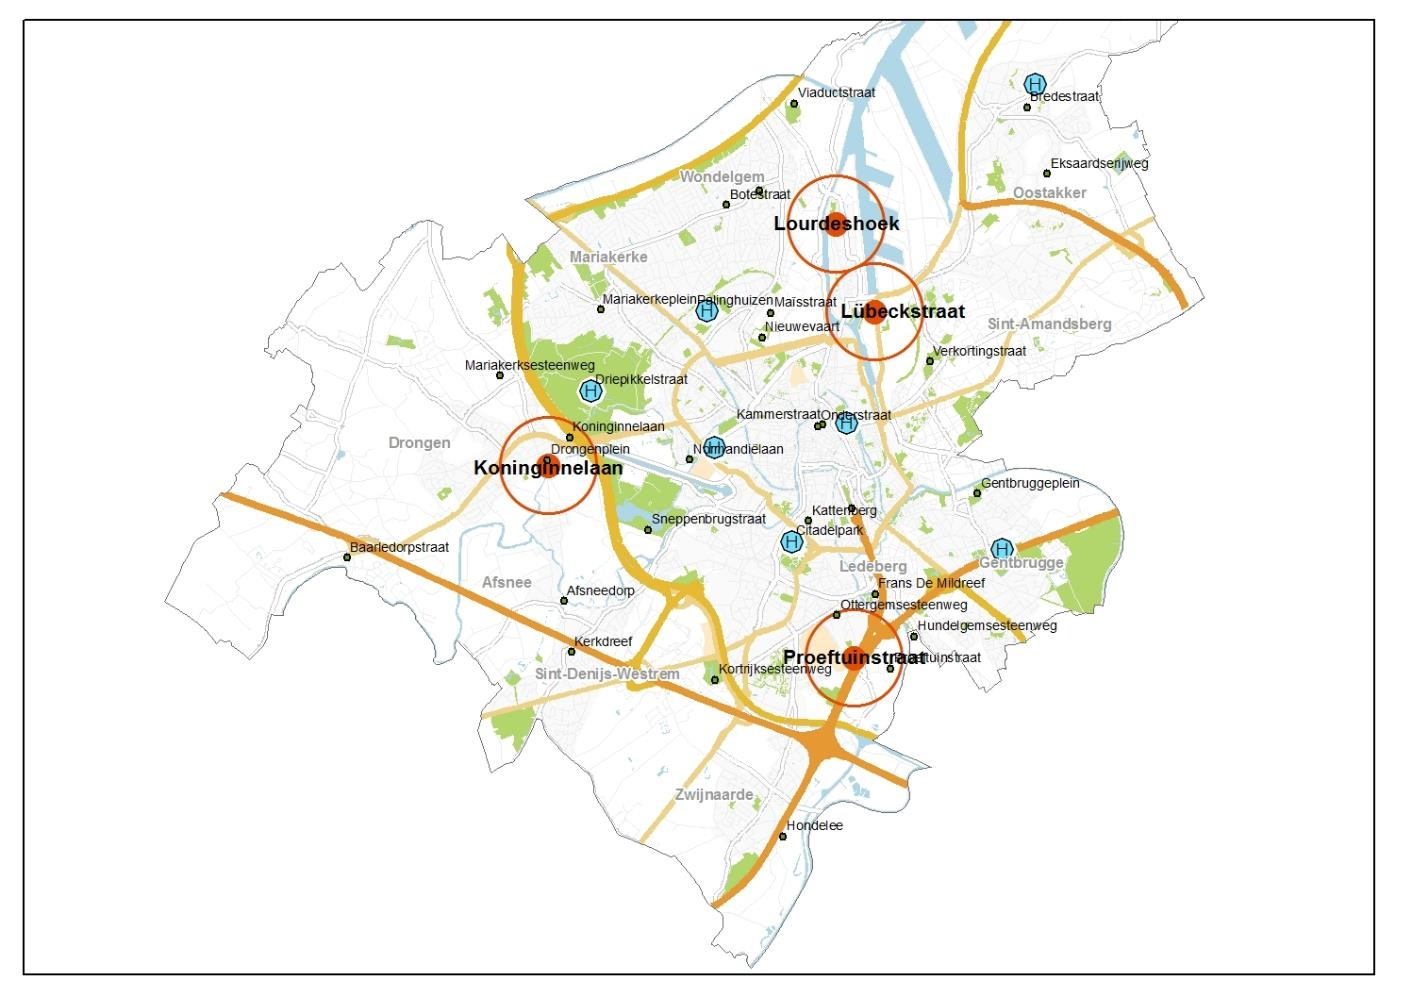 Geografische spreiding depots.jpg